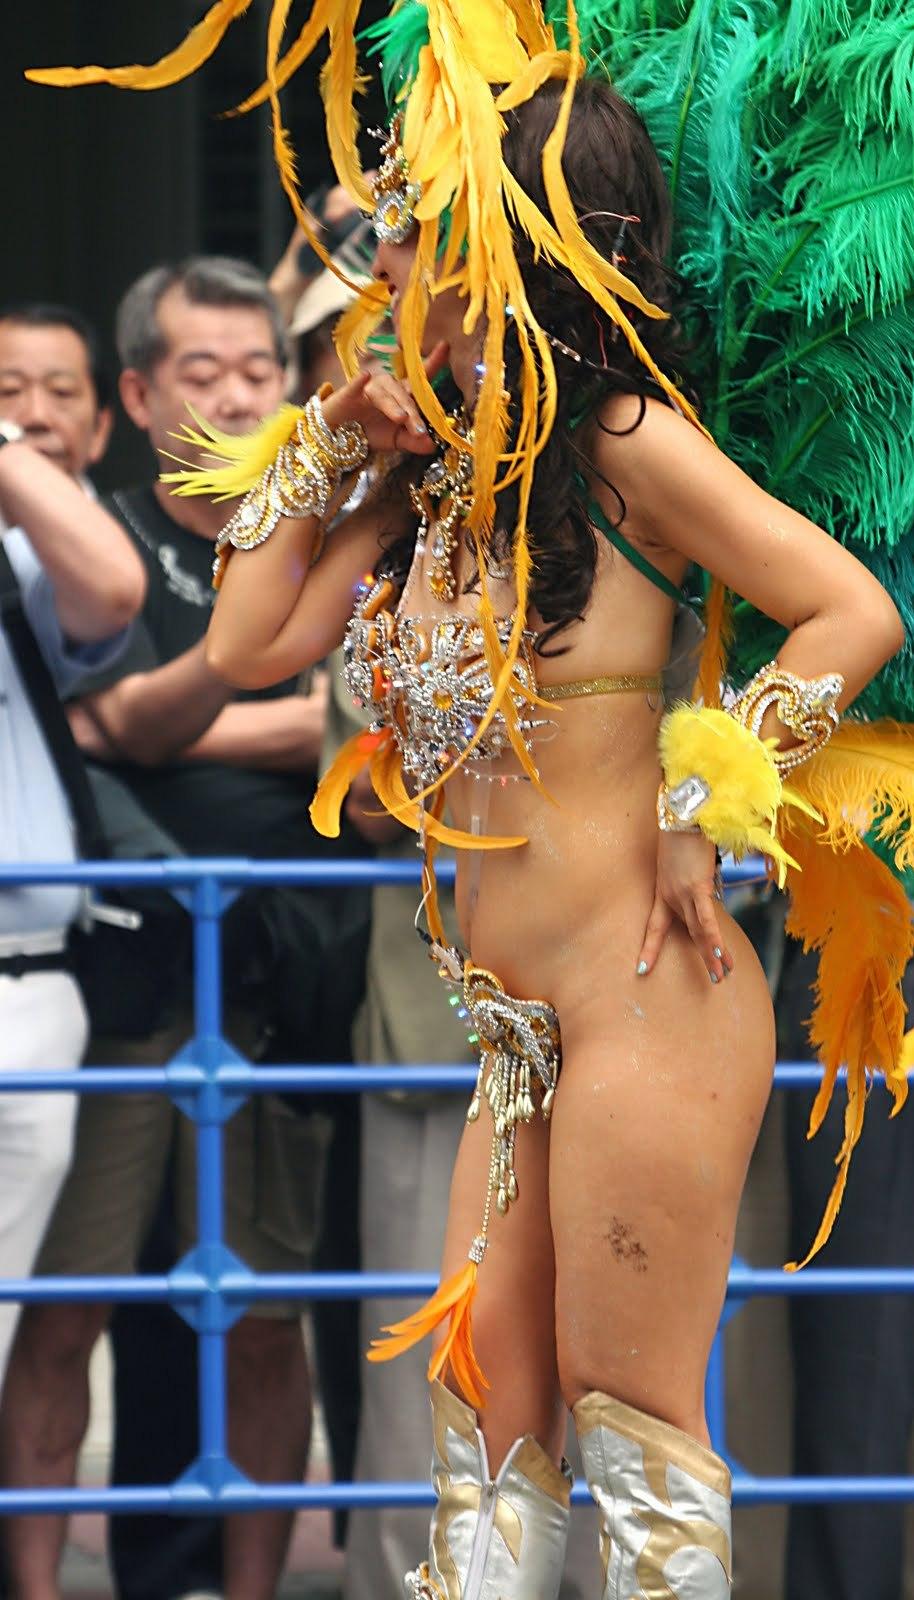 Asakusa, Tokyo Japan, Asakusa Samba Carnival 2006 - With Service